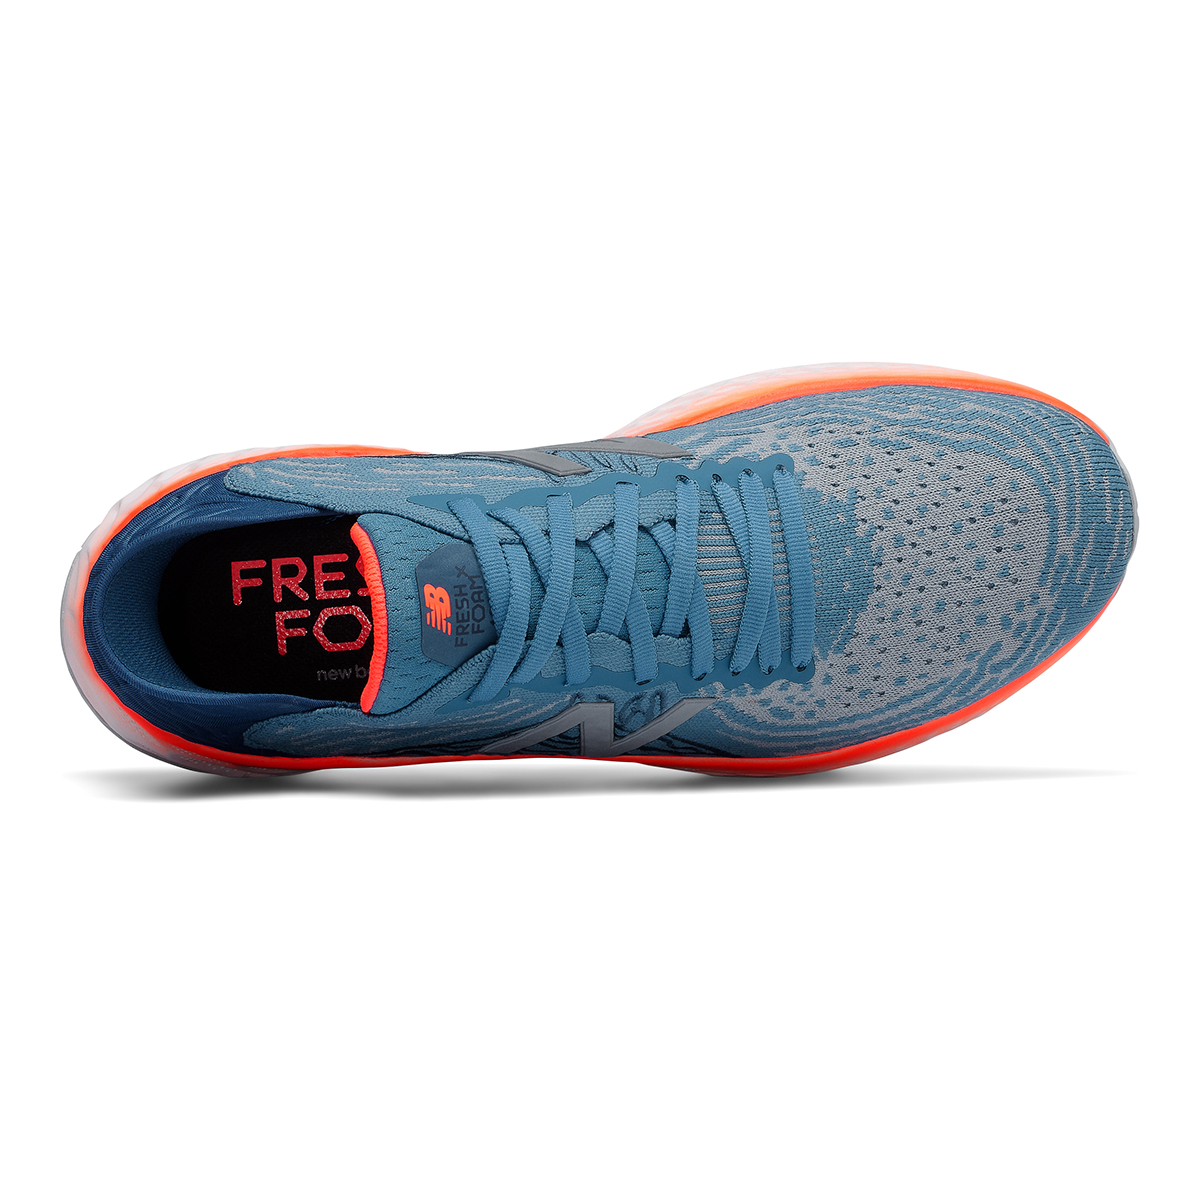 Men's New Balance Fresh Foam 1080v10 Running Shoe - Color: Light Blue - Size: 7 - Width: Regular, Light Blue, large, image 3